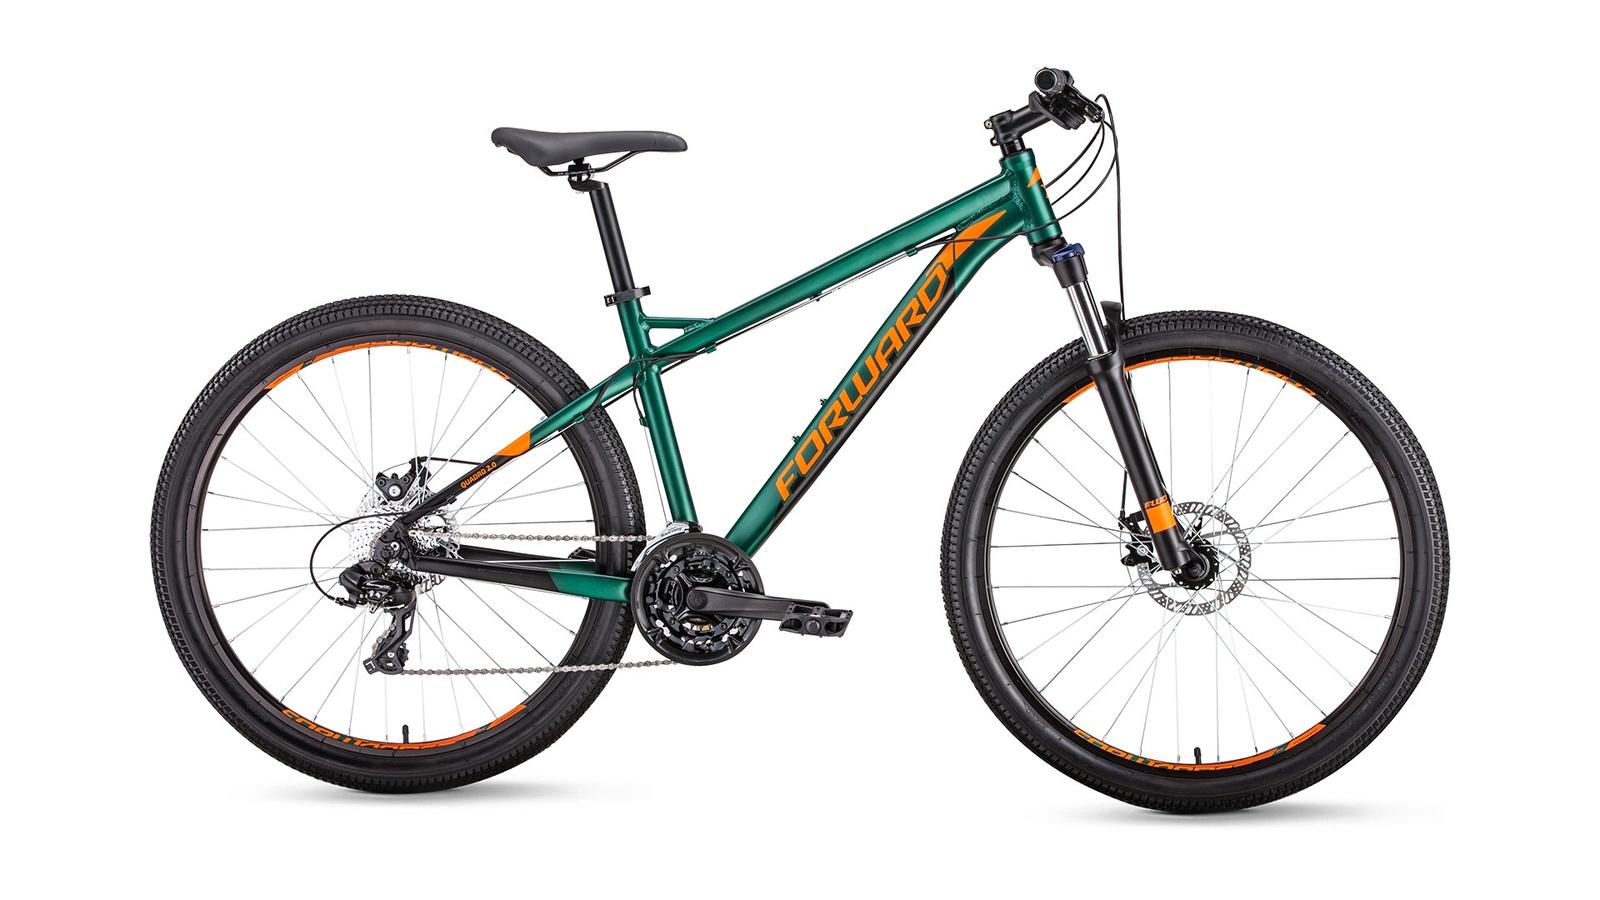 Велосипед Forward Quadro 27,5 2.0 disc, зеленый